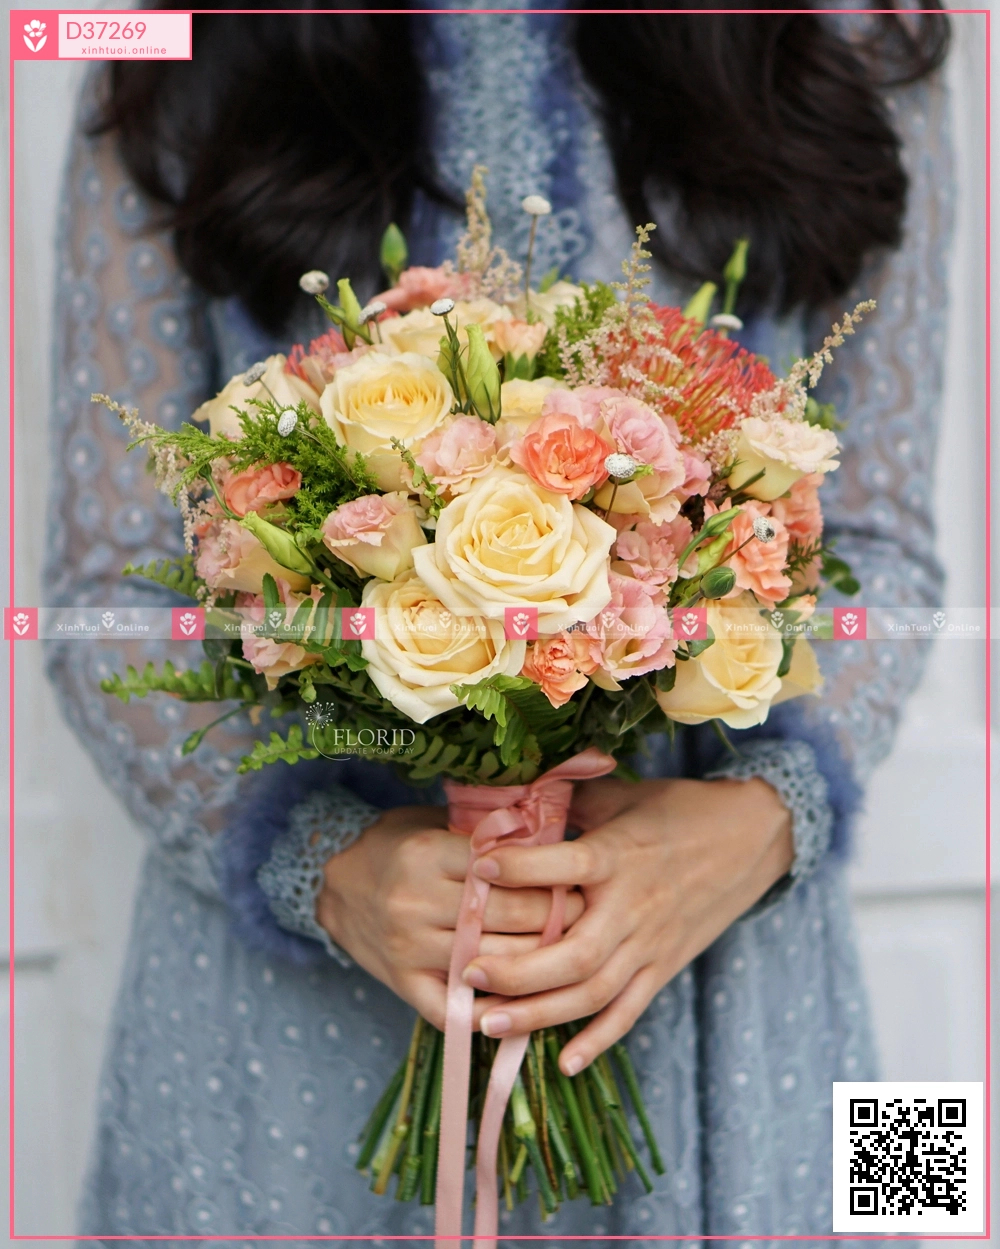 Bó hoa cưới 154156 - D37269 - xinhtuoi.online